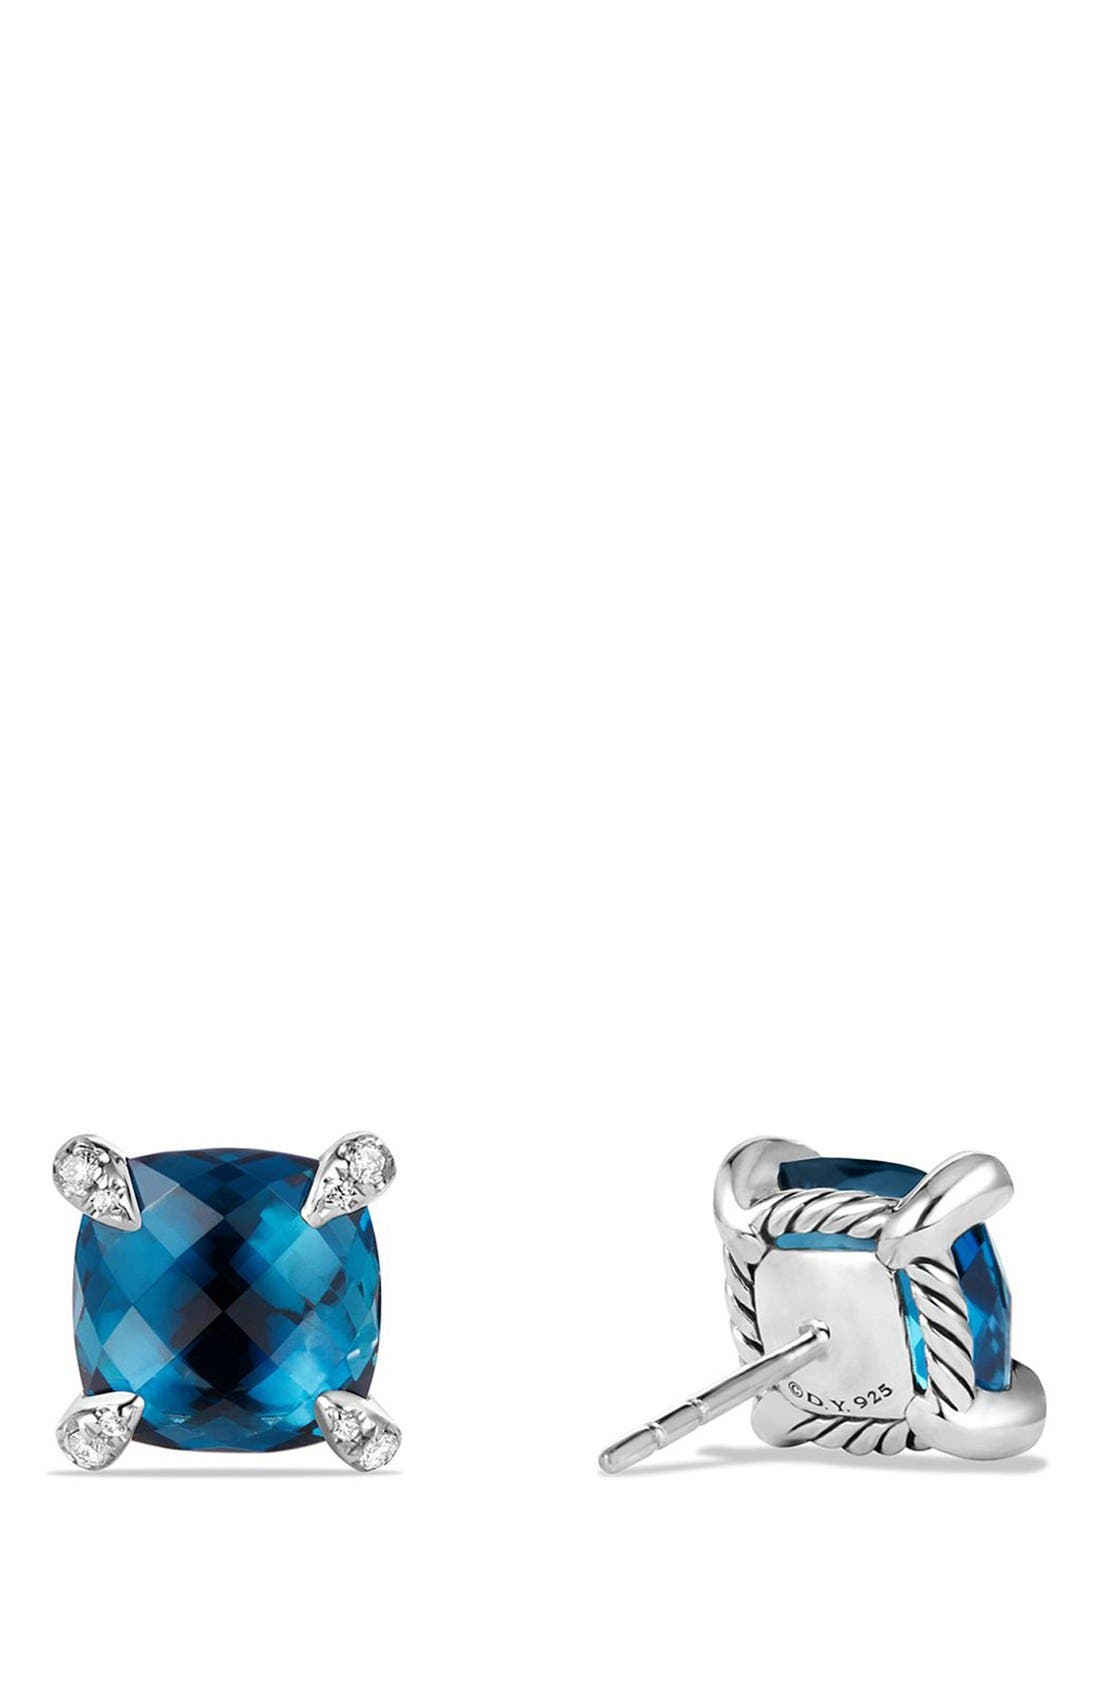 DAVID YURMAN, 'Châtelaine' Earrings with Semiprecious Stones and Diamonds, Alternate thumbnail 2, color, SILVER/ HAMPTON BLUE TOPAZ